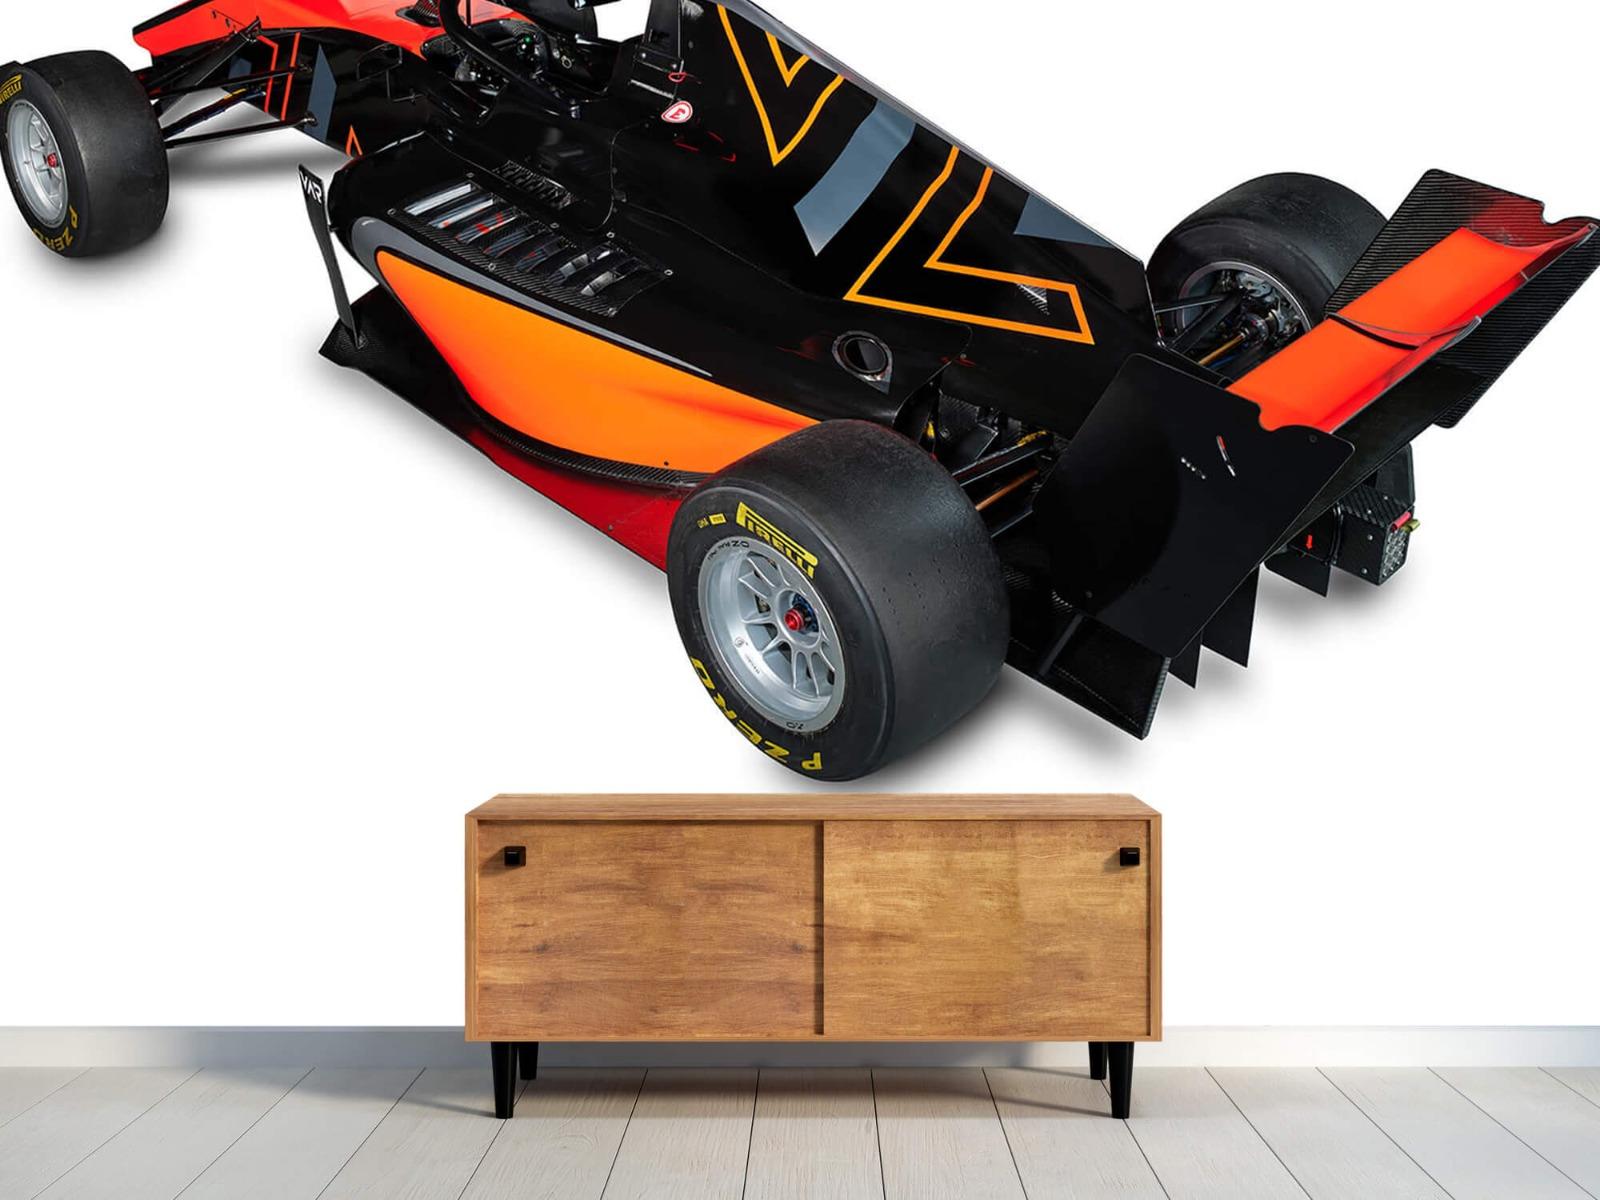 Sportauto's - Formula 3 - Rear left view - Hobbykamer 10